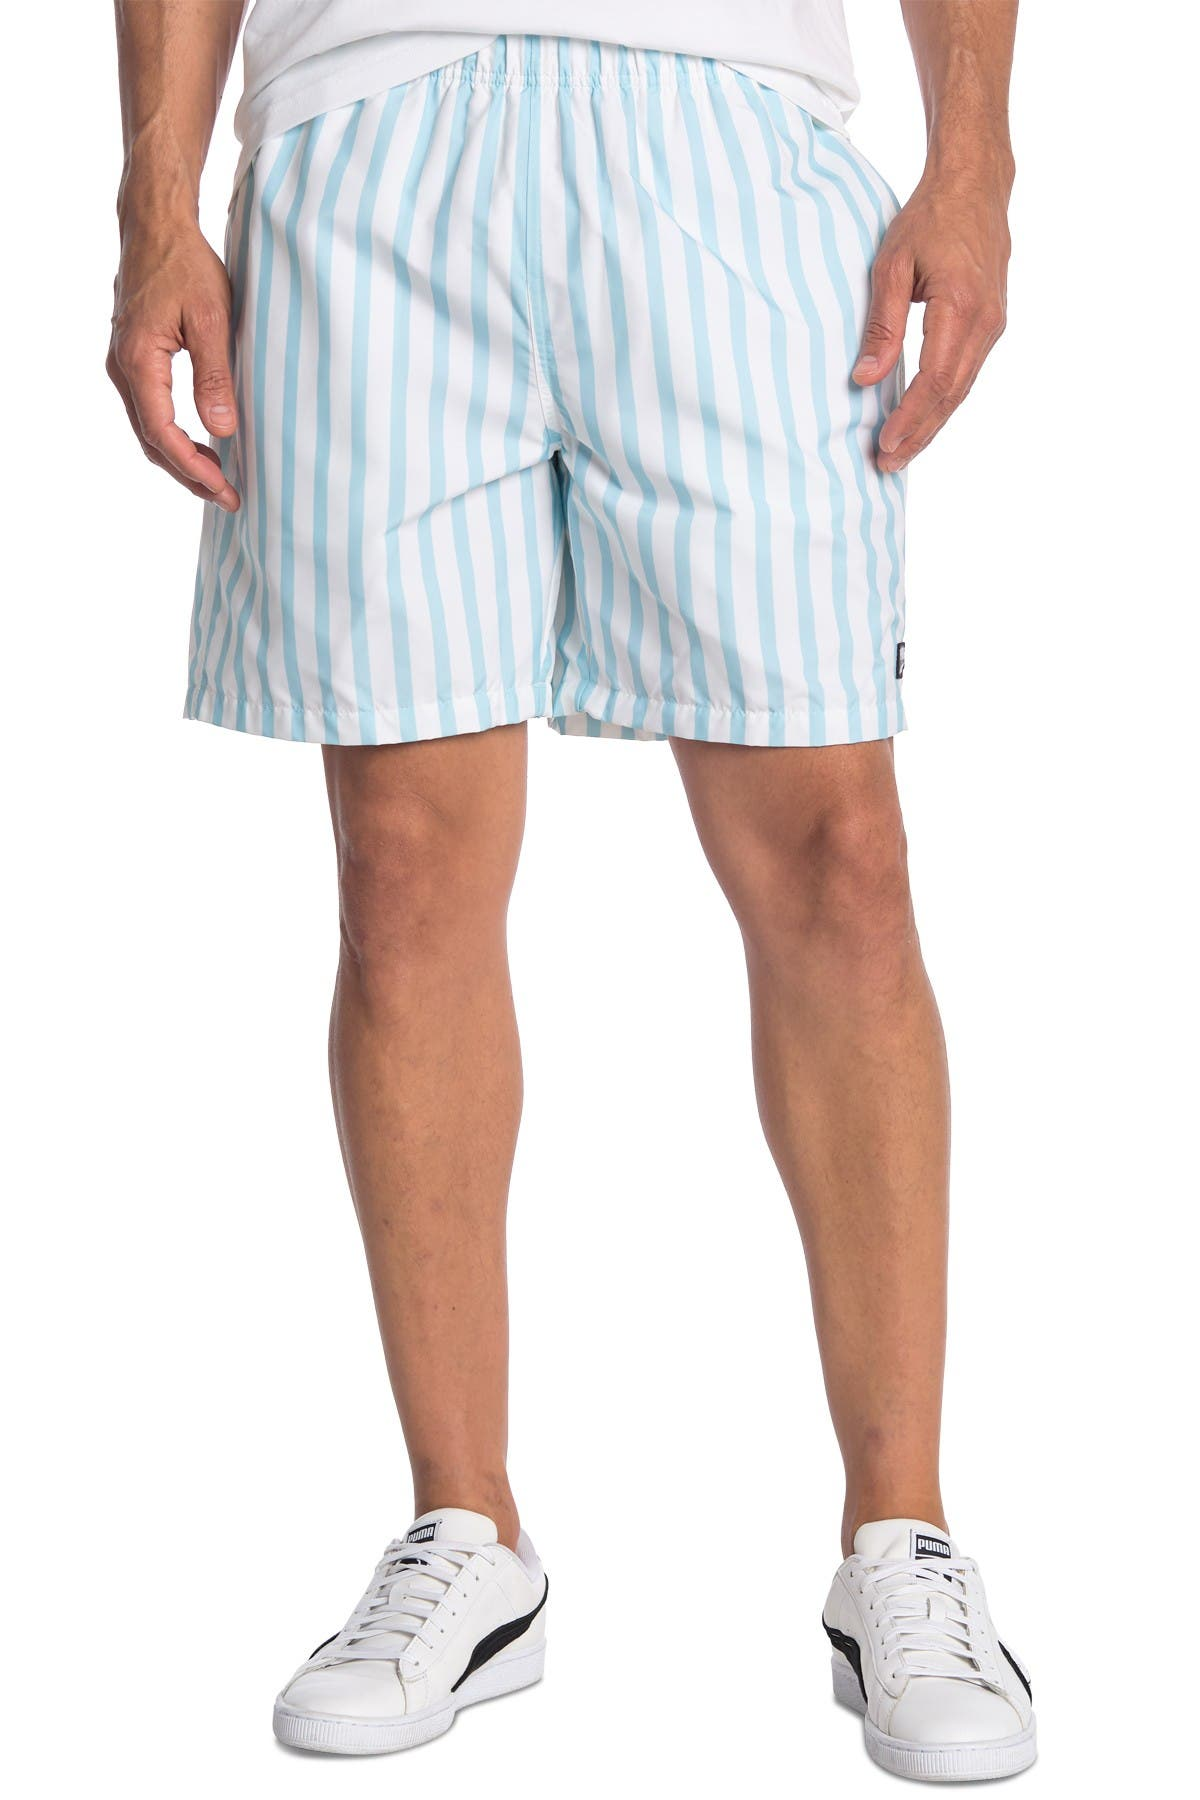 PUMA | Downtown Striped Shorts